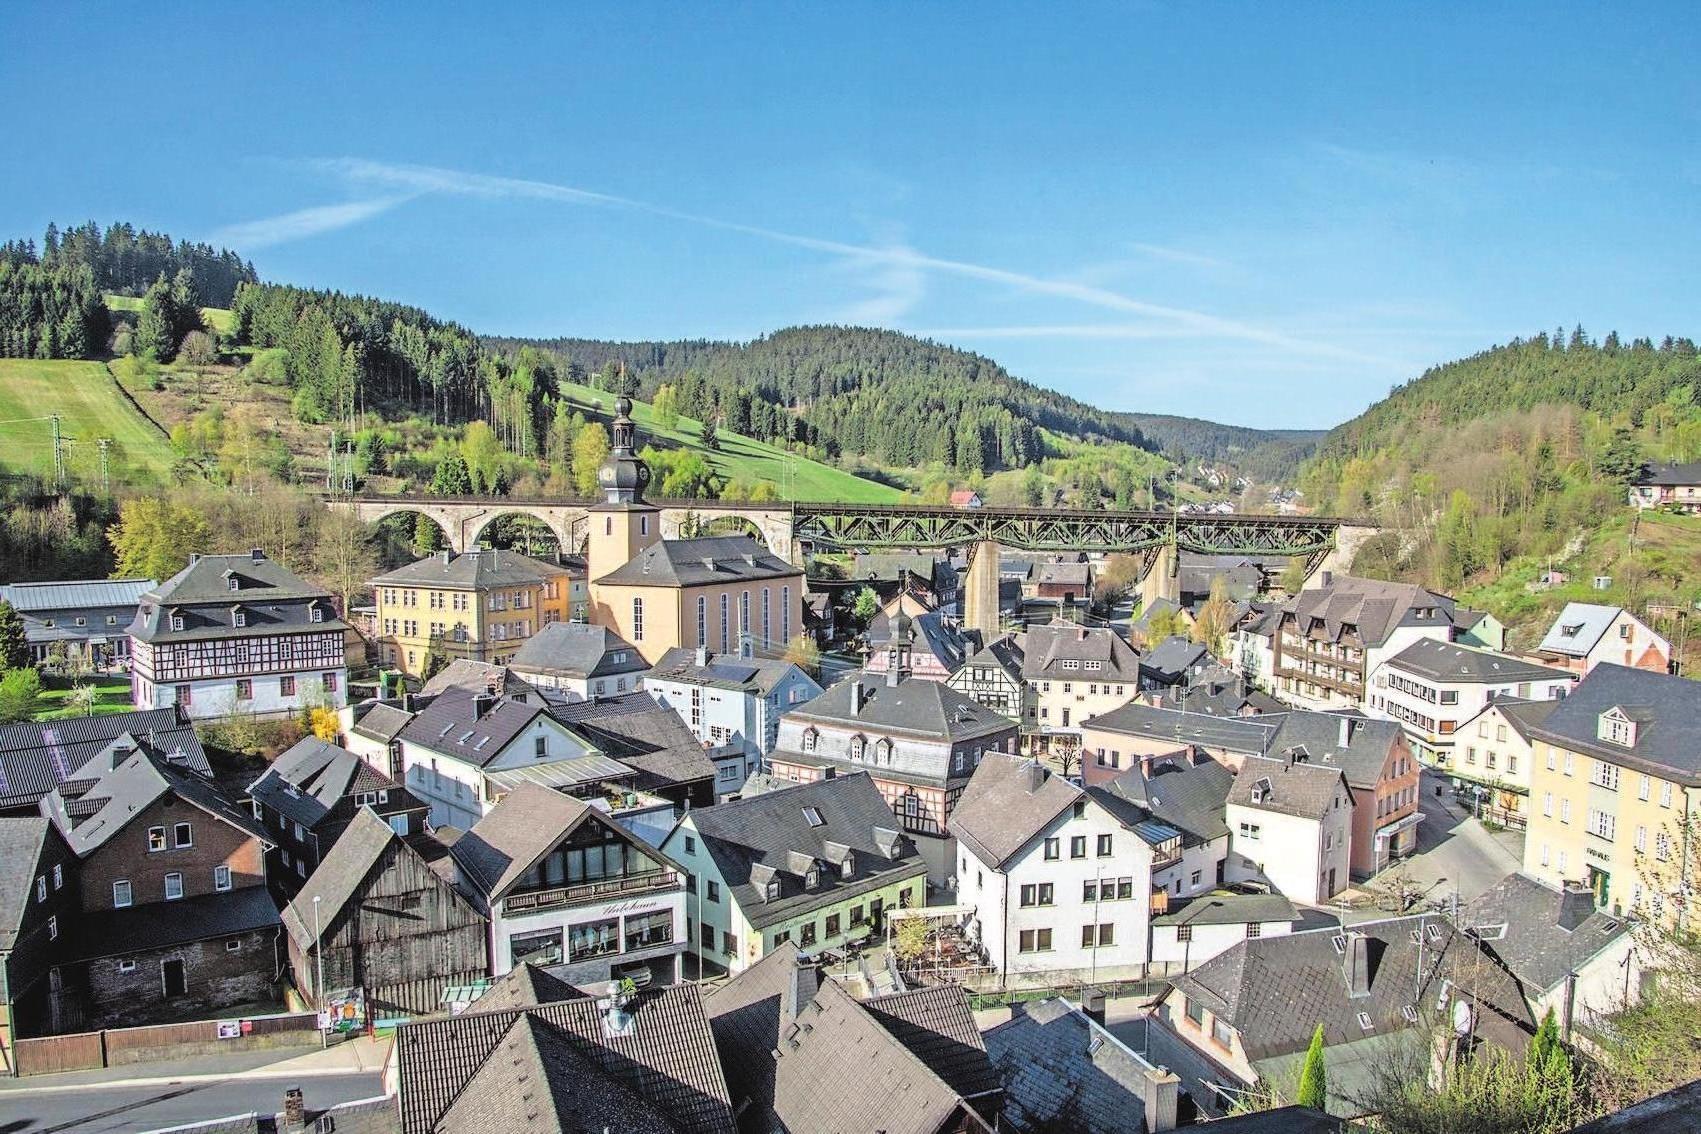 Am 2. Juni feiert Ludwigsstadt sein 750-jähriges Jubiläum. Foto: Siegfried Scheidig